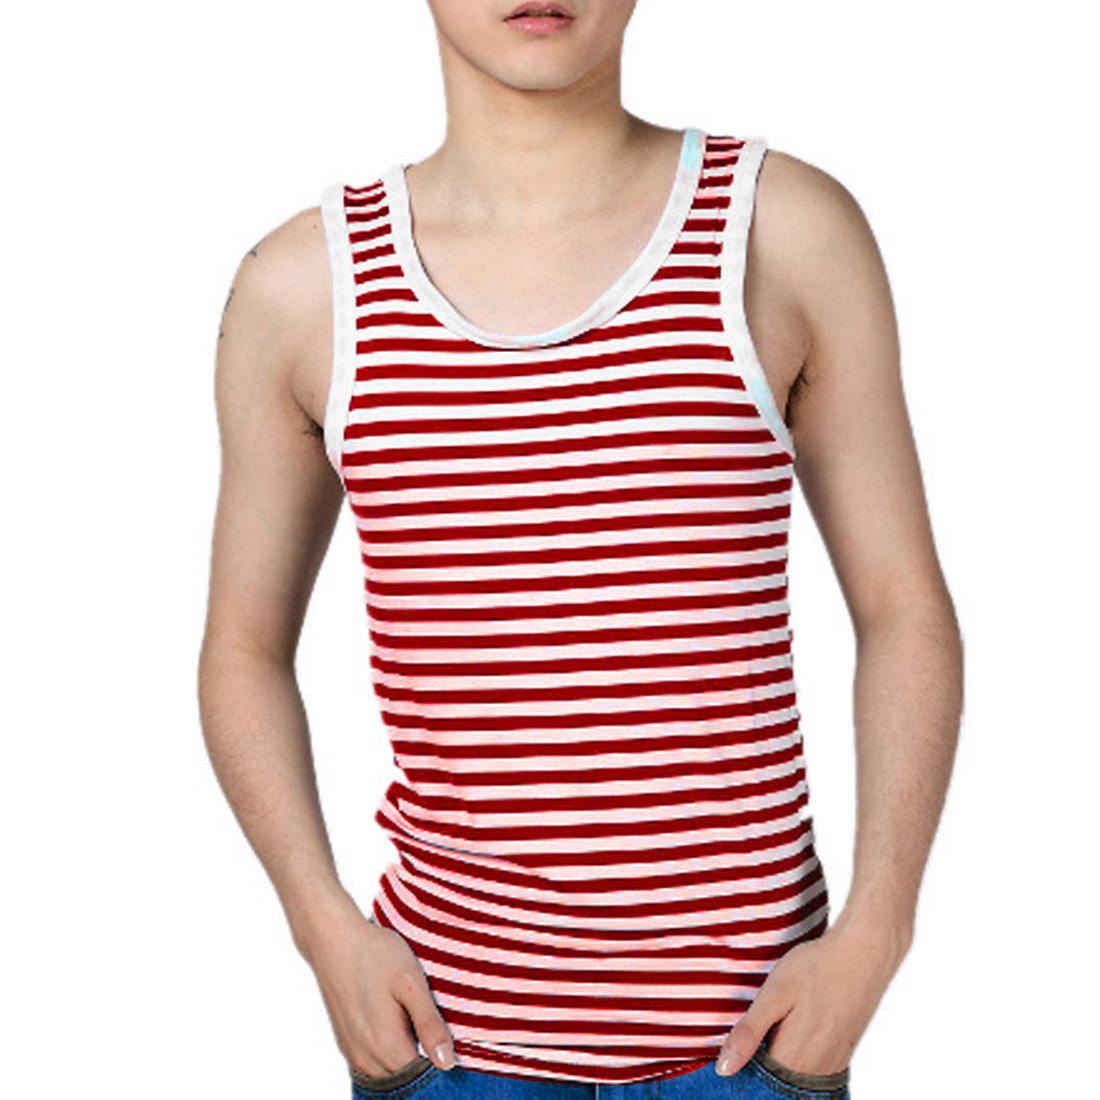 Men U Neck Pullover Sleeveless Stripes Stretchy Leisure Tank Top Burgundy White S